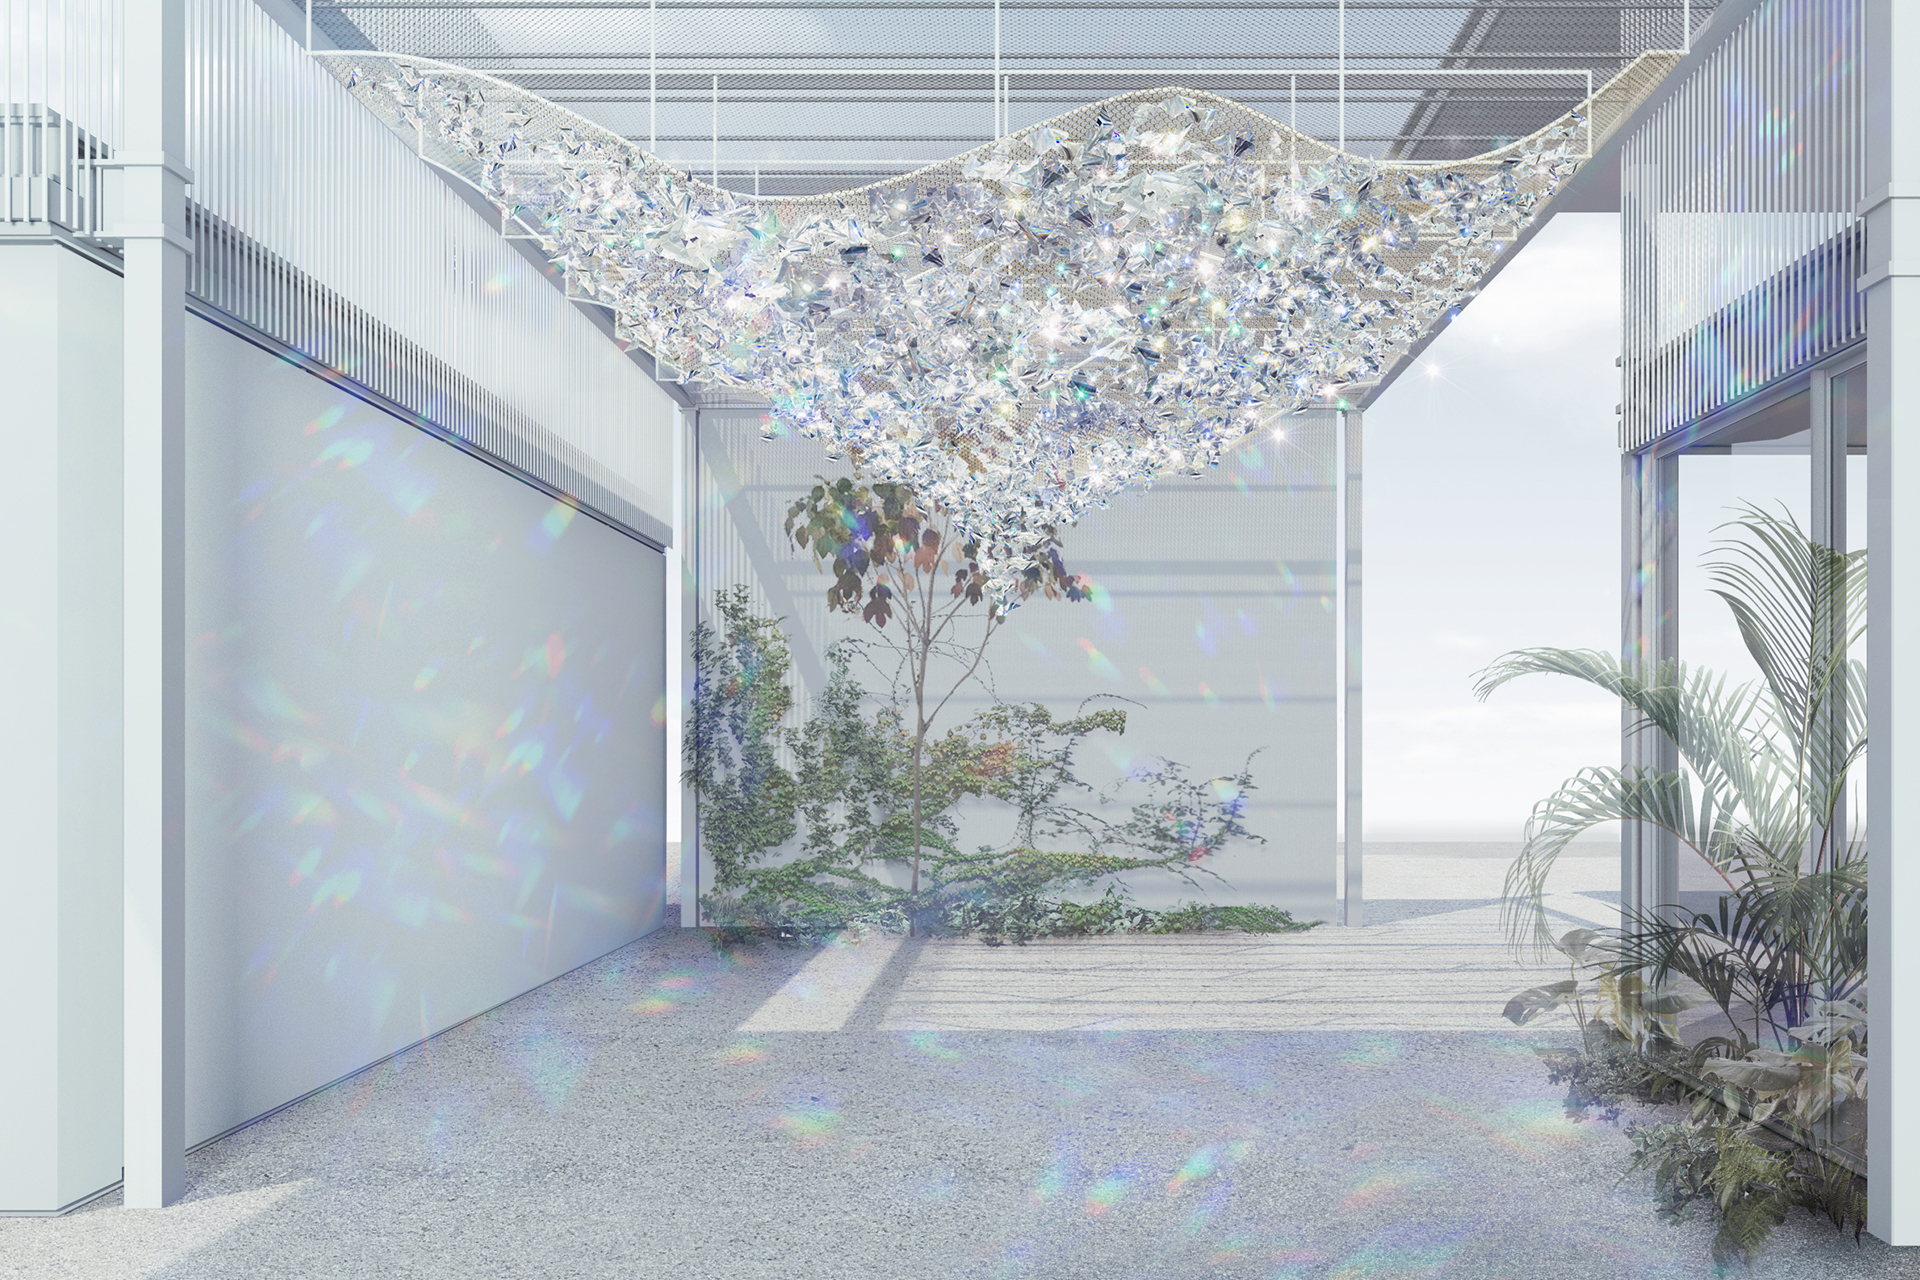 ARTBAY TOKYO x TAKAHIRO MATSUO「PRISM / GLOW」展